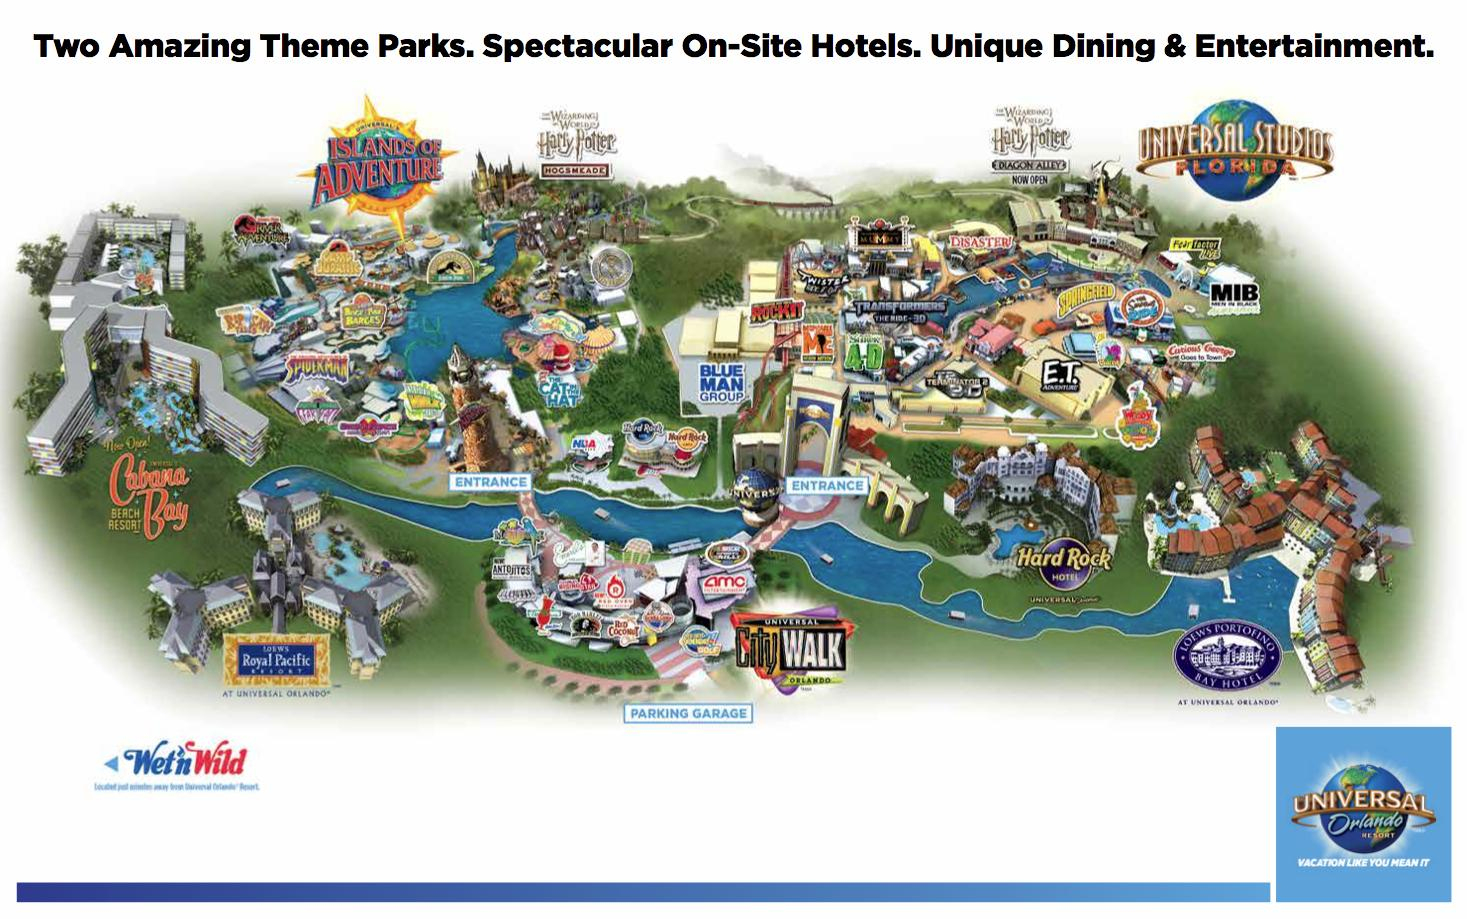 Universal Orlando Mapart Exhibitionuniversal Studios Park - States - Universal Florida Park Map